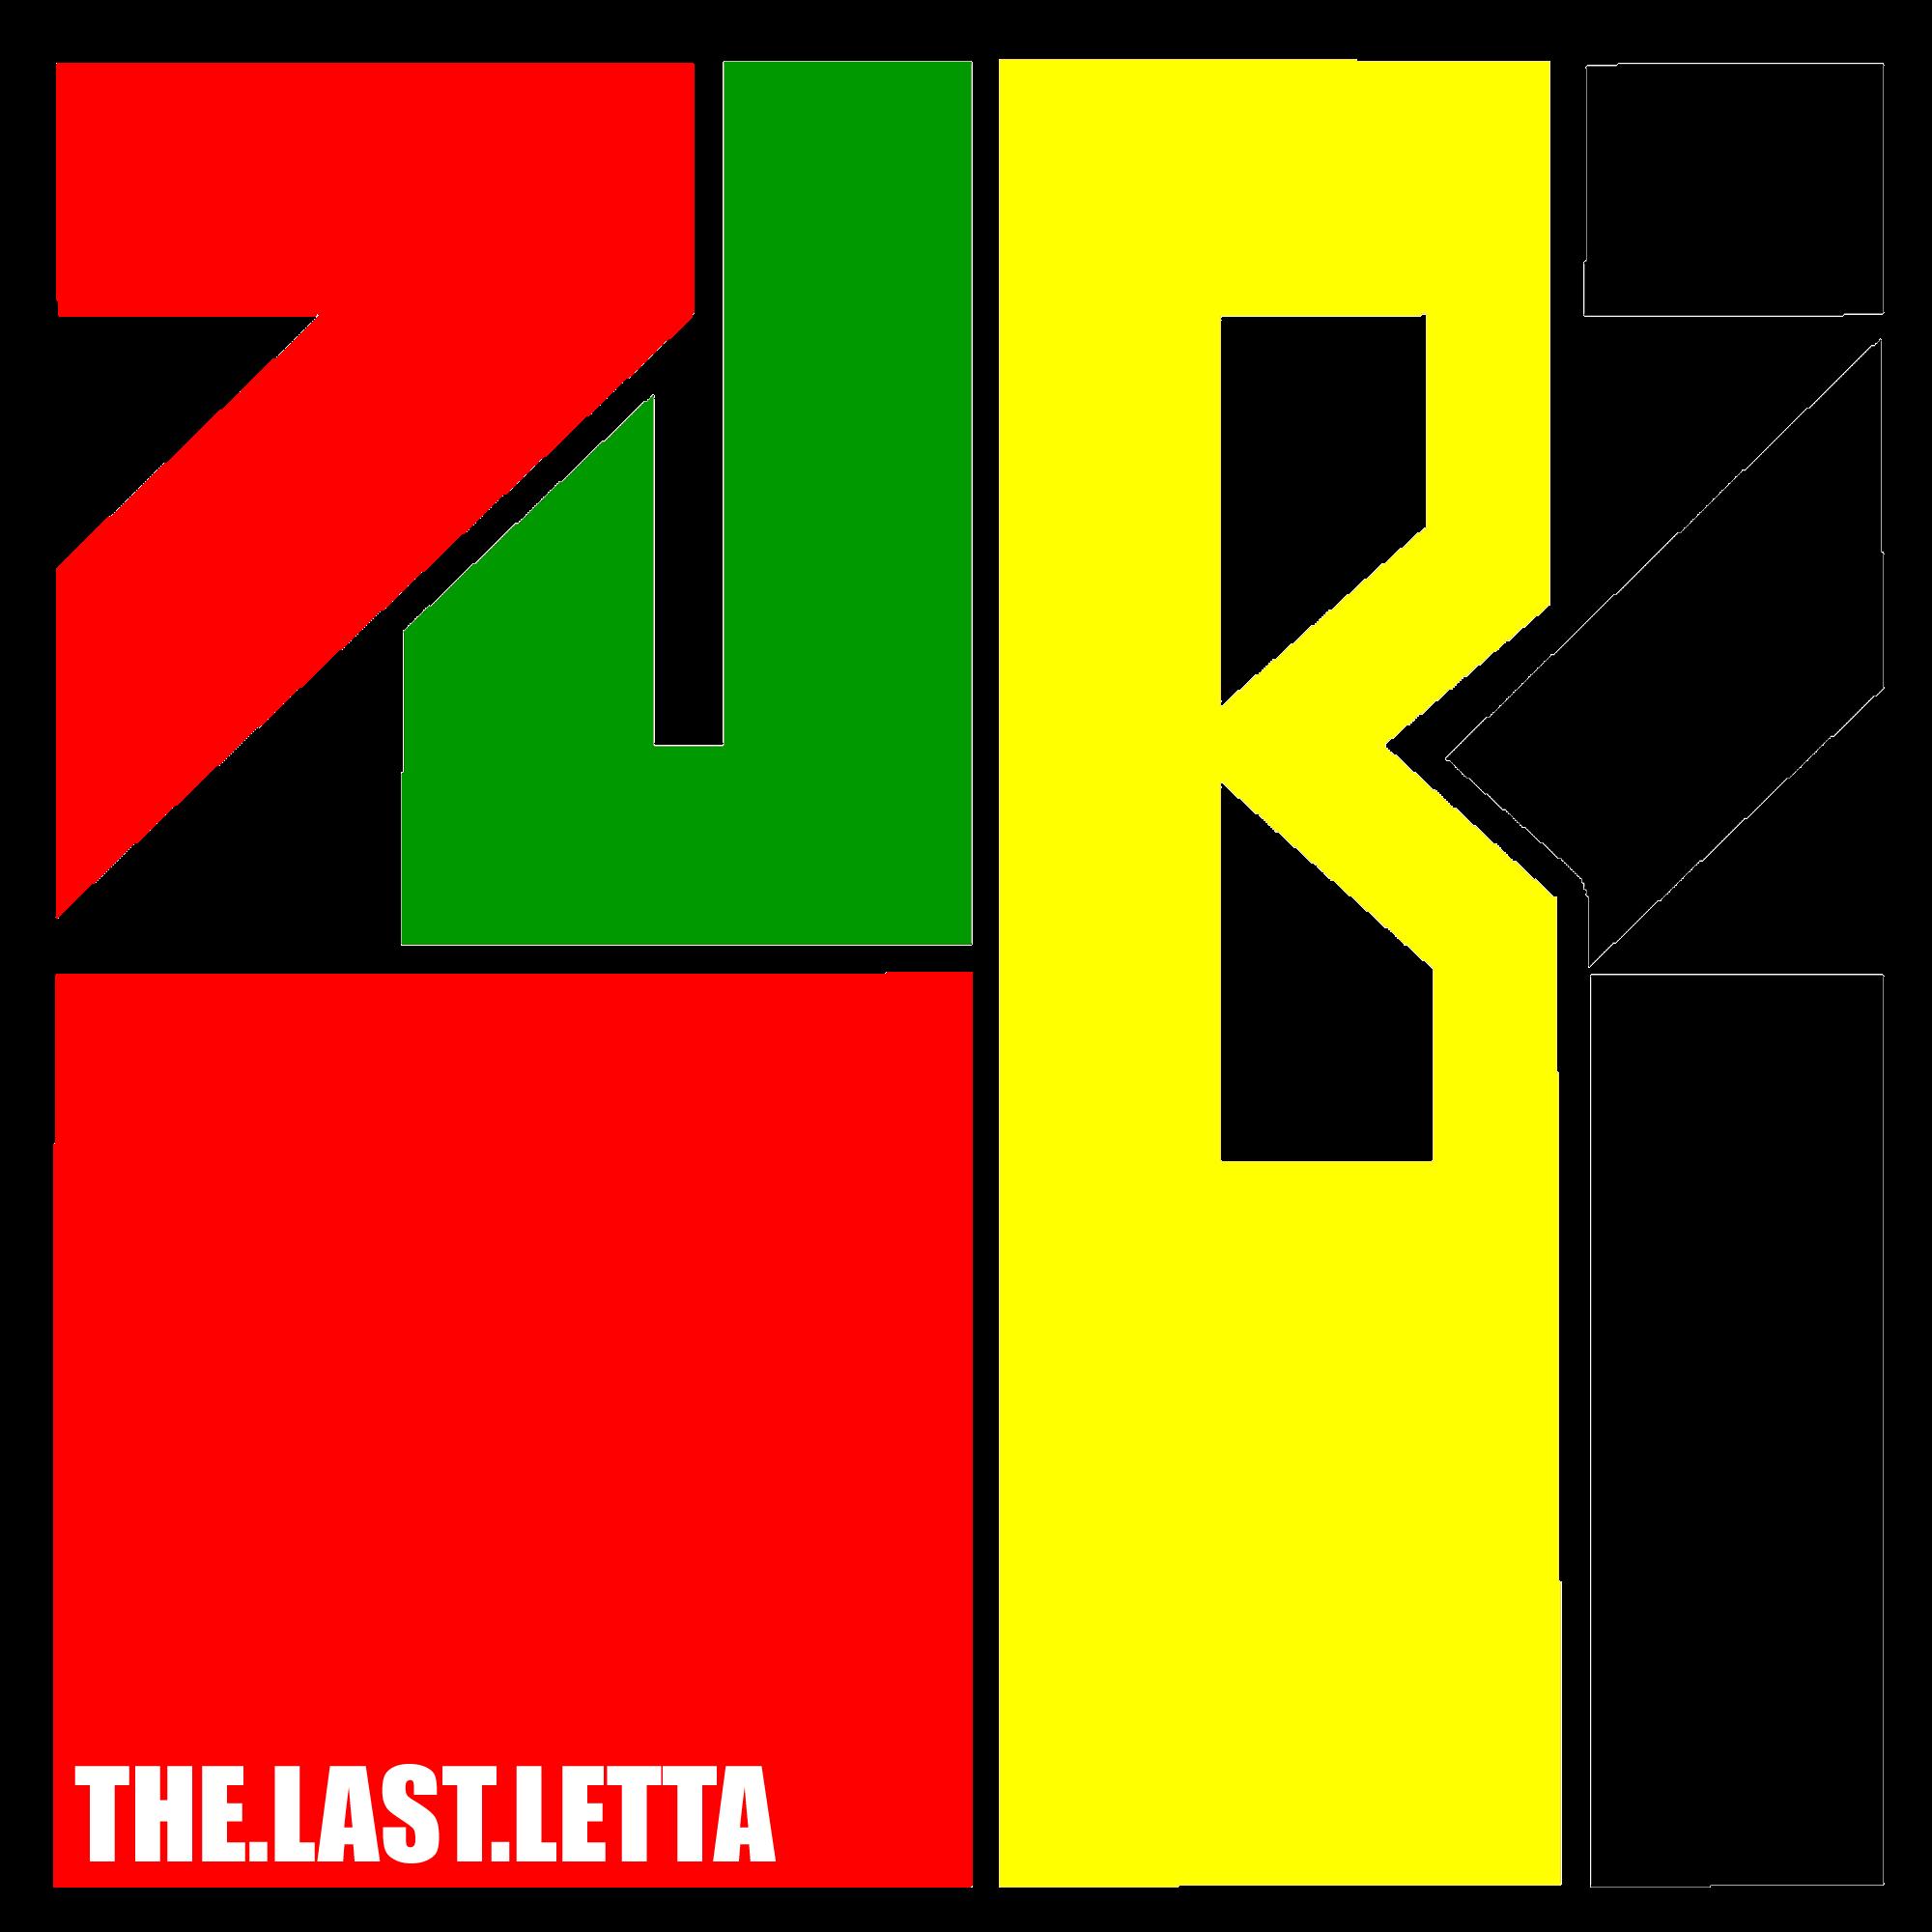 Zubz - The Last Letta